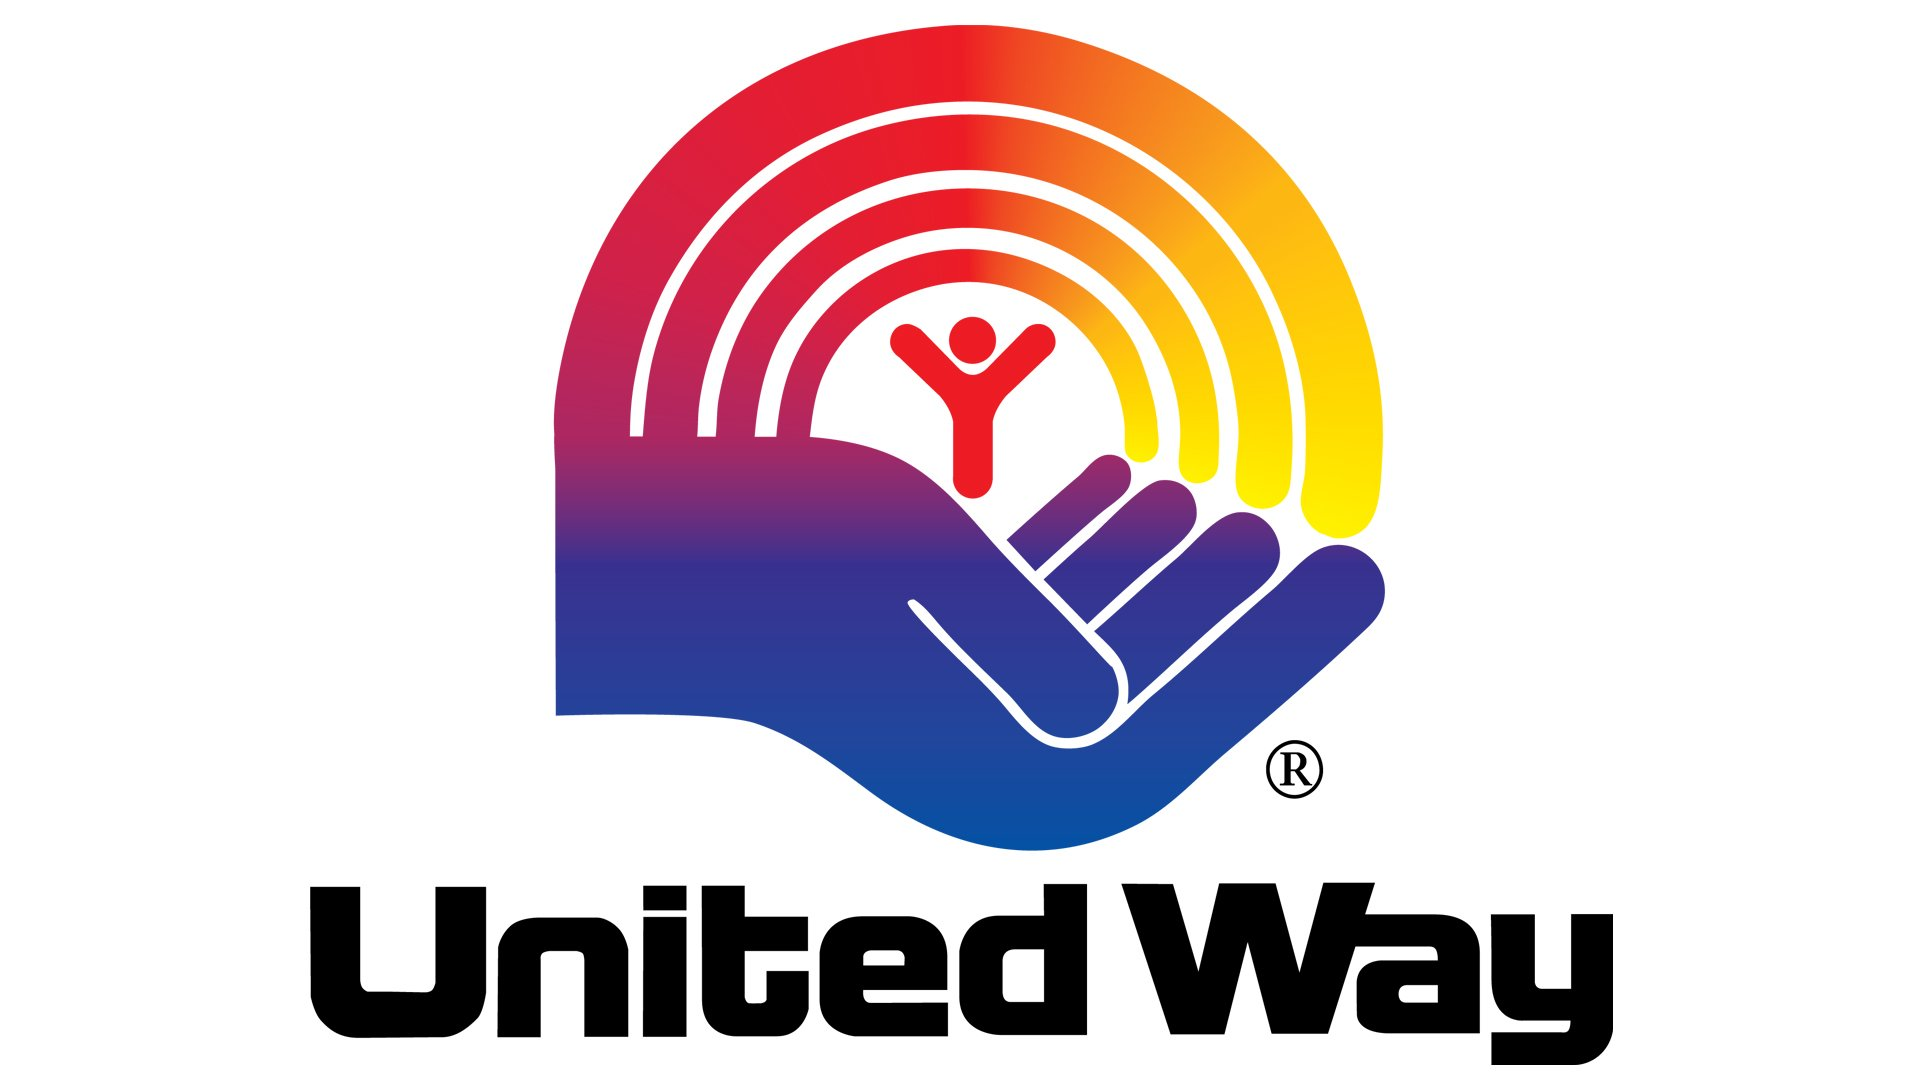 United Way Logo, United Way Symbol, Meaning, History and ...